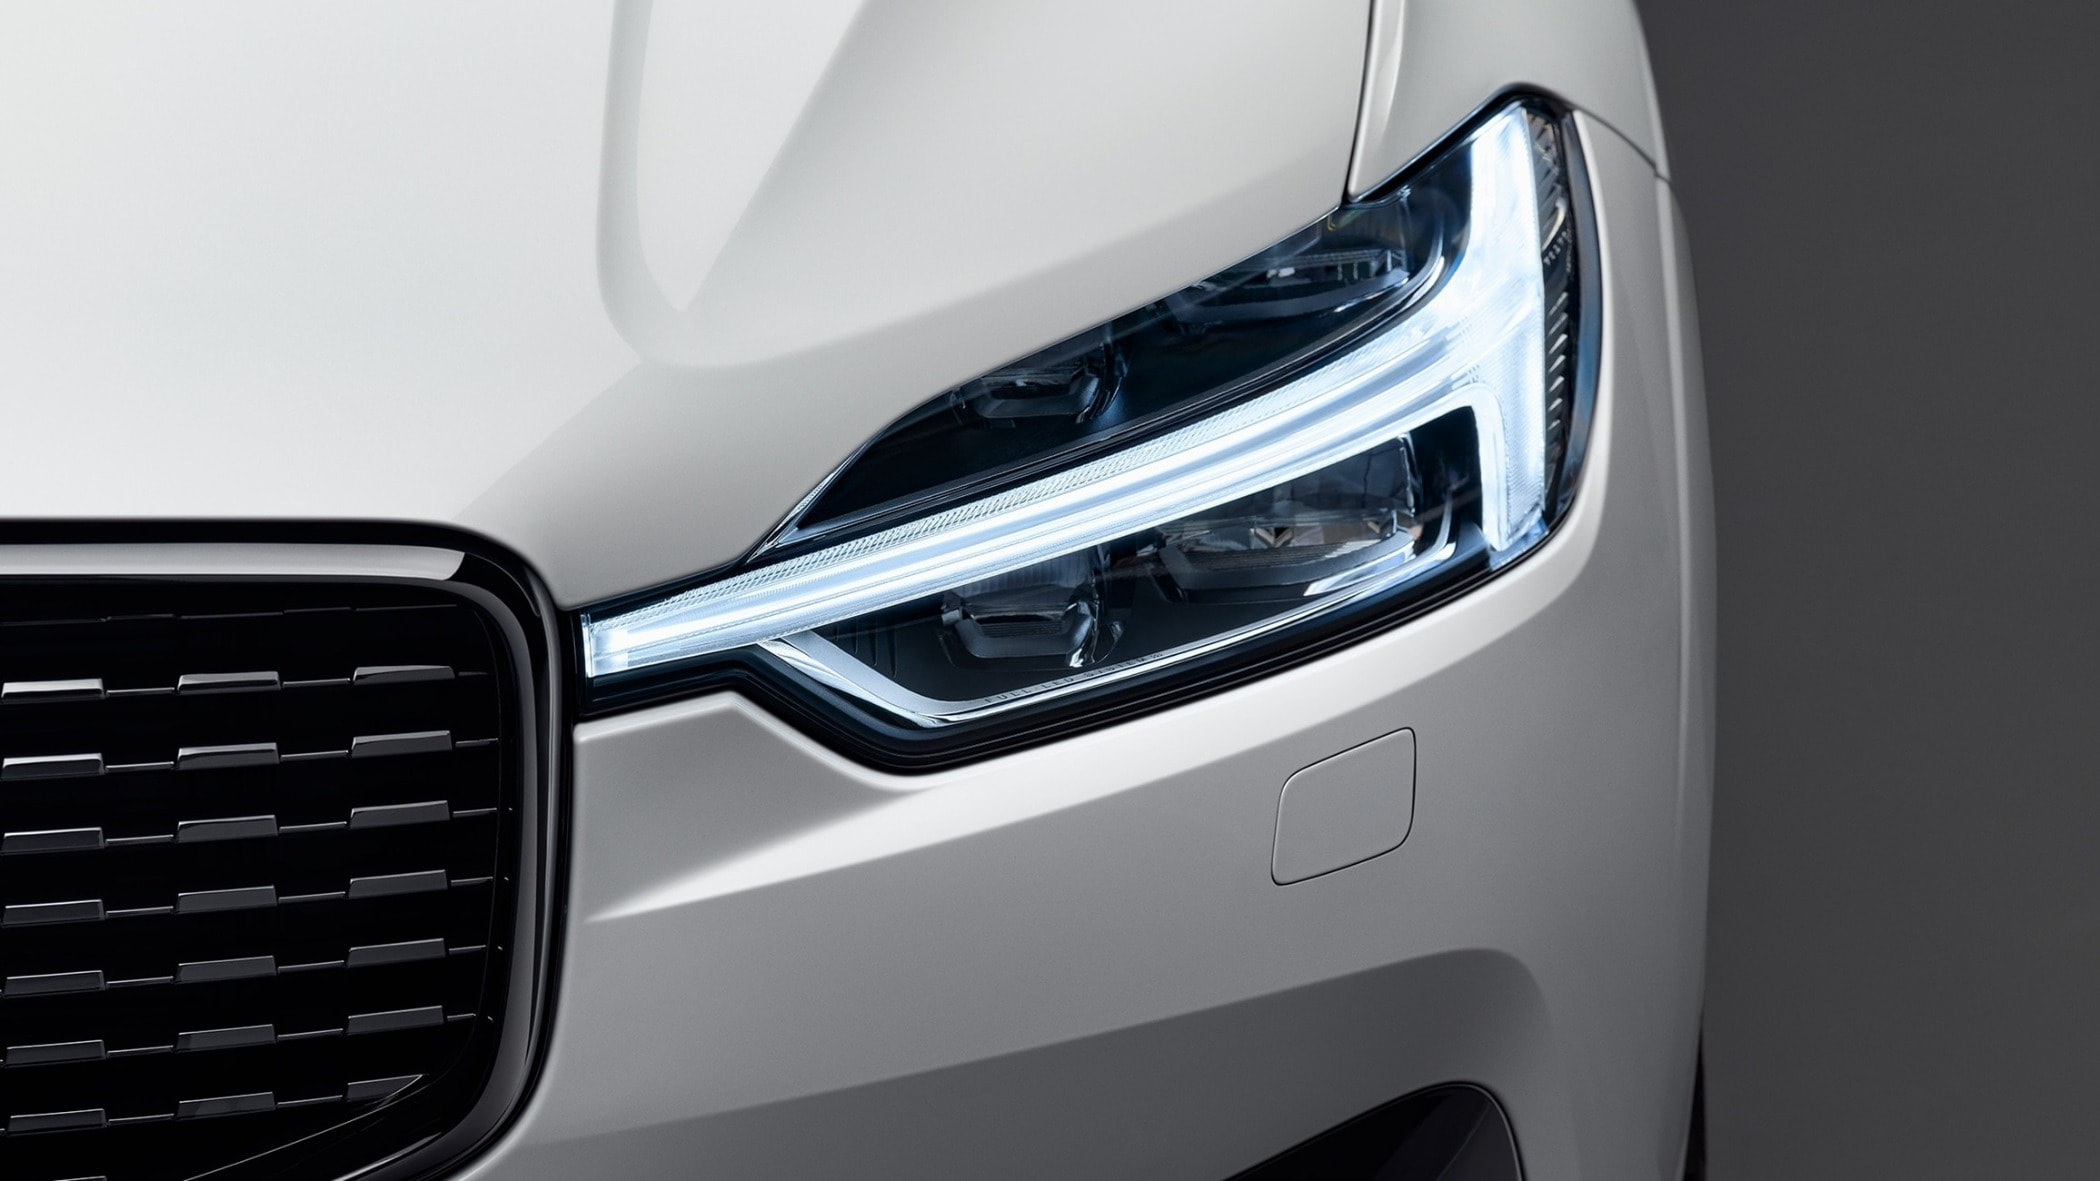 Luxury vehicle, Automotive lighting, Grille, Light, White, Headlamp, Car